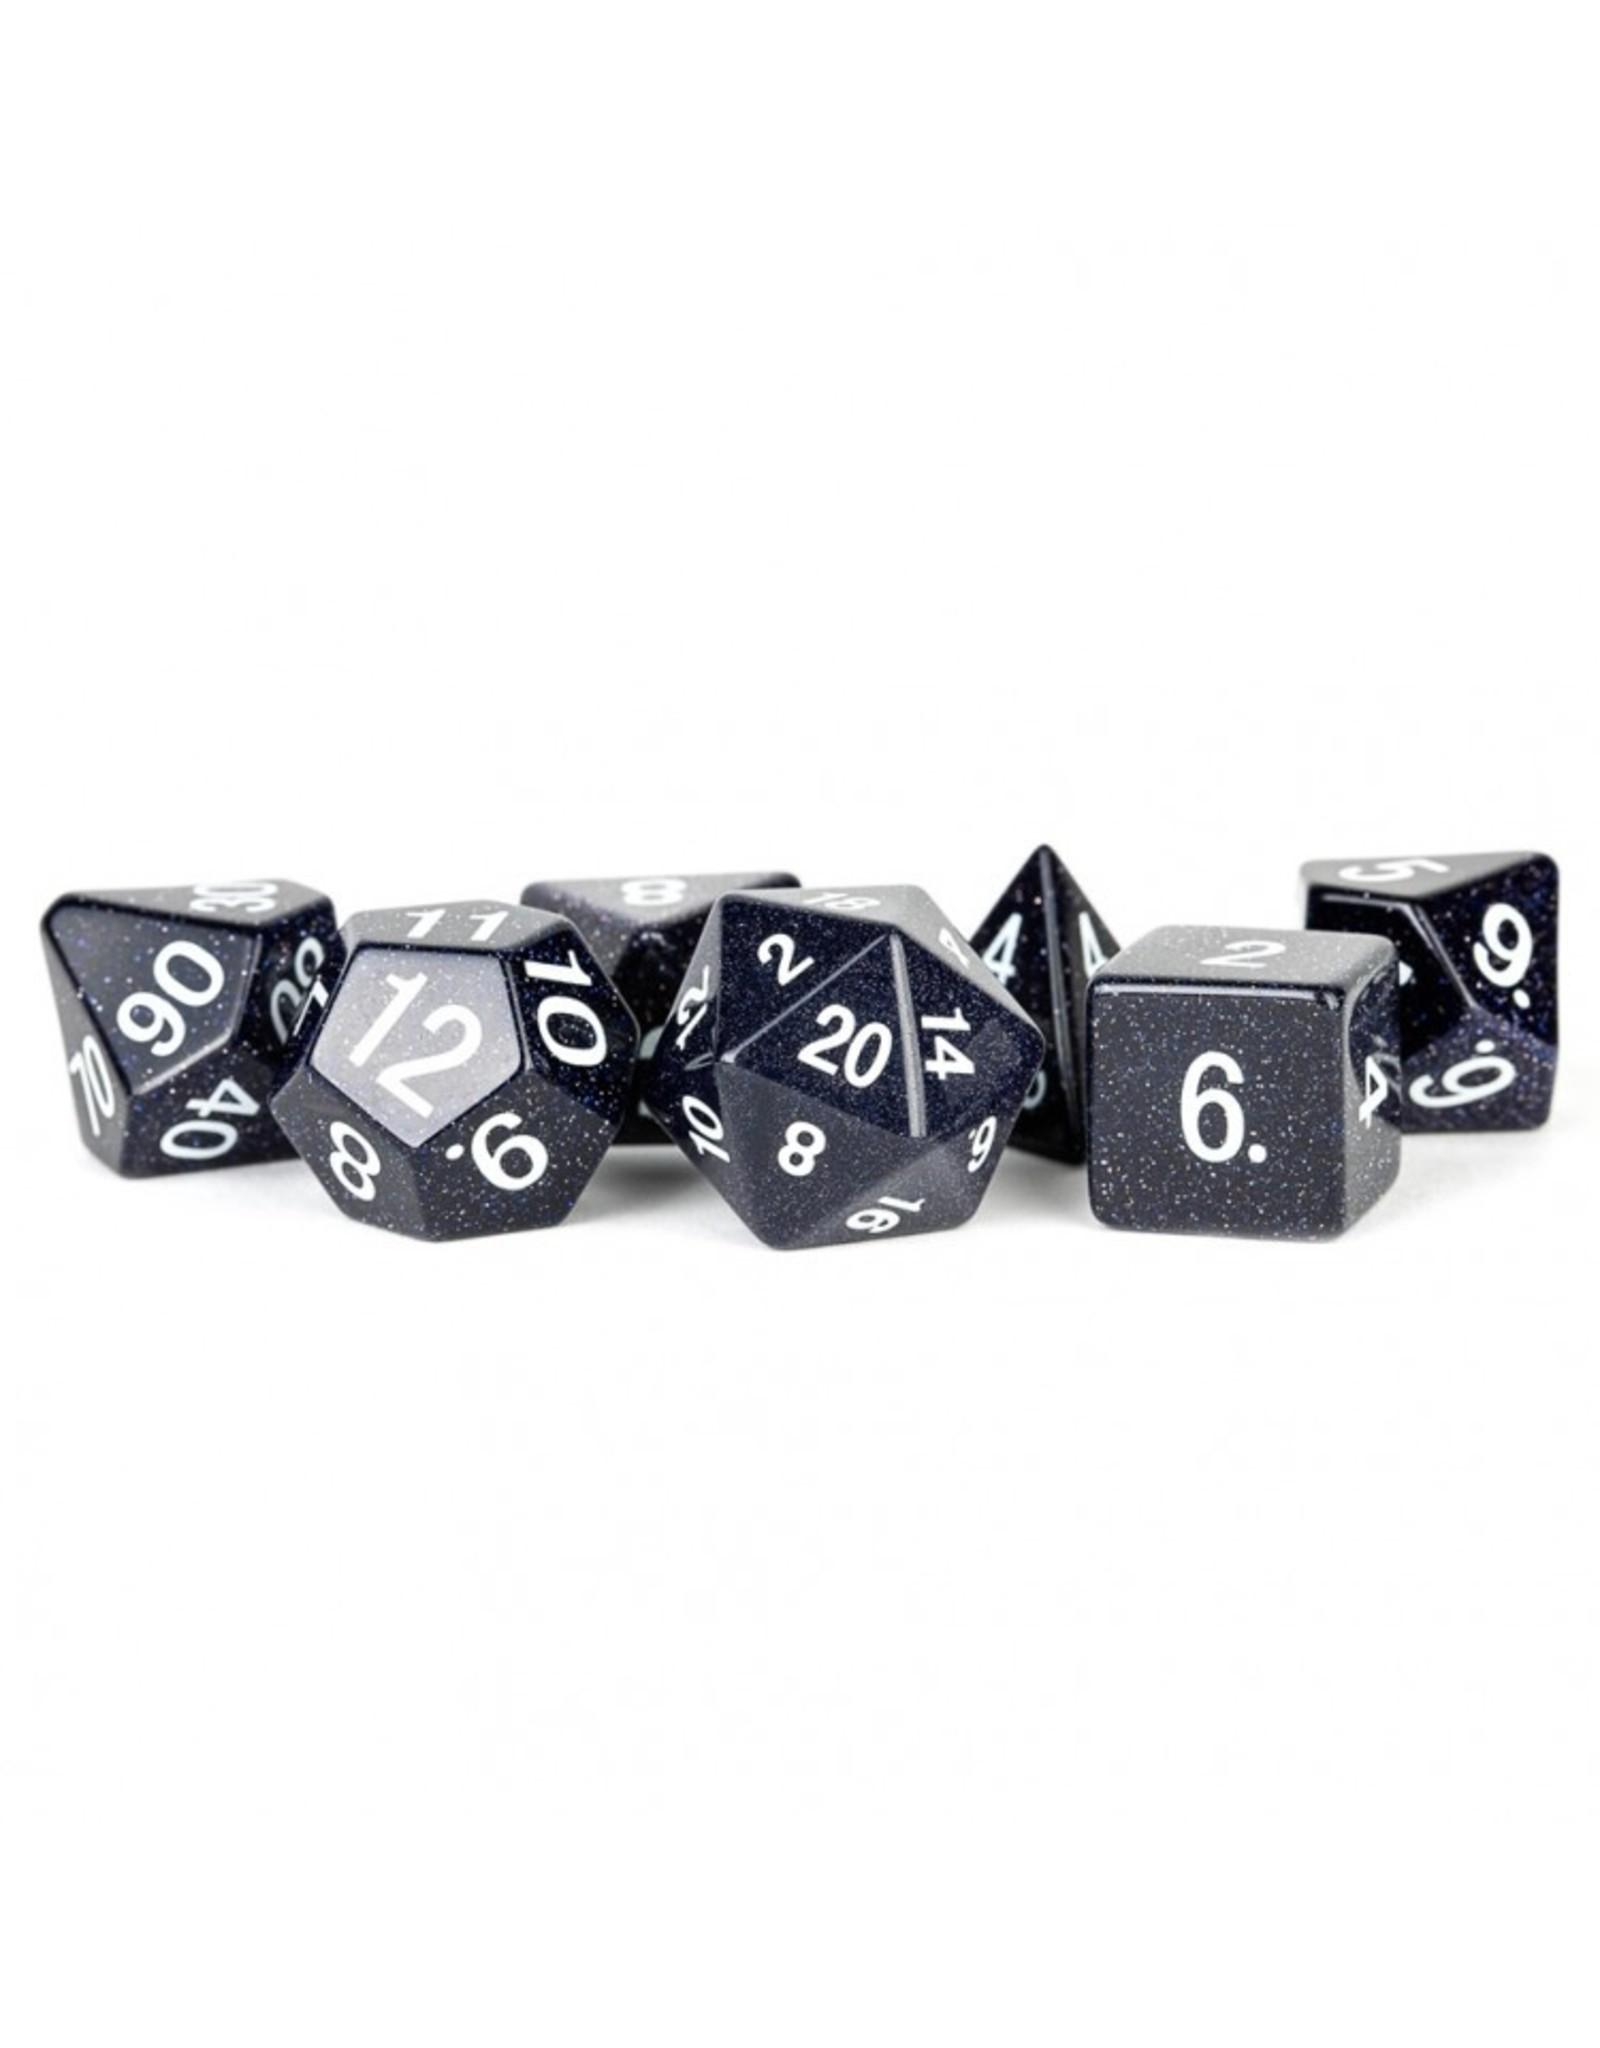 Metallic Dice Games 7-Set Blue Sandstone